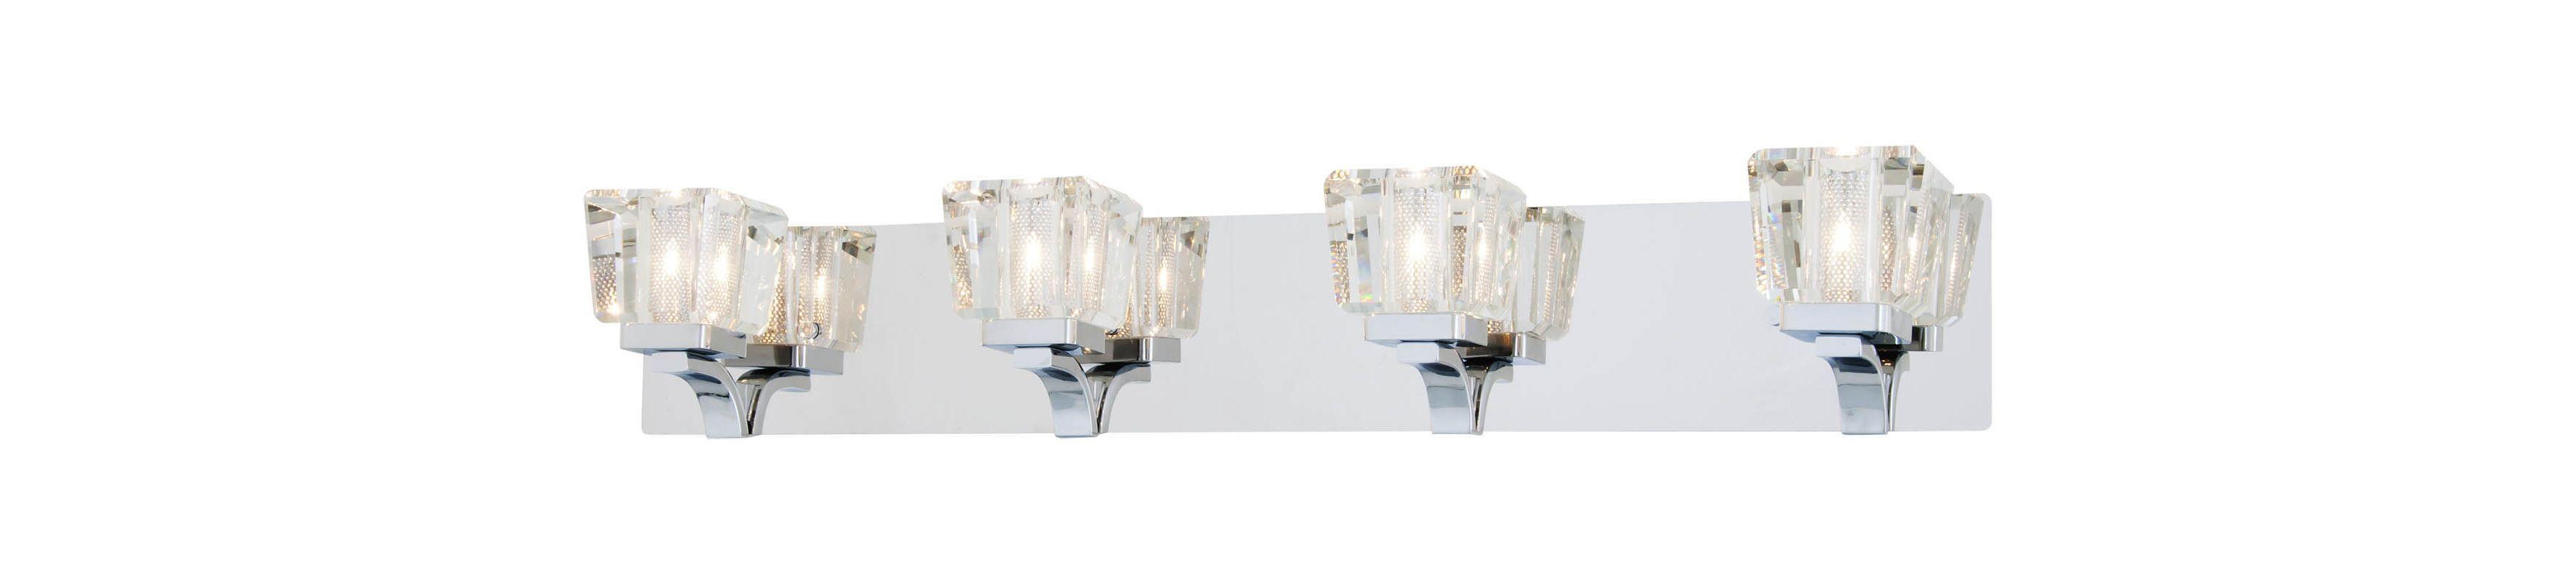 DVI Lighting DVP0744 Beausoleil 4 Light Bathroom Vanity Light Chrome / Sale $487.90 ITEM: bci2273256 ID#:DVP0744CH-CRY UPC: 61467035868 :